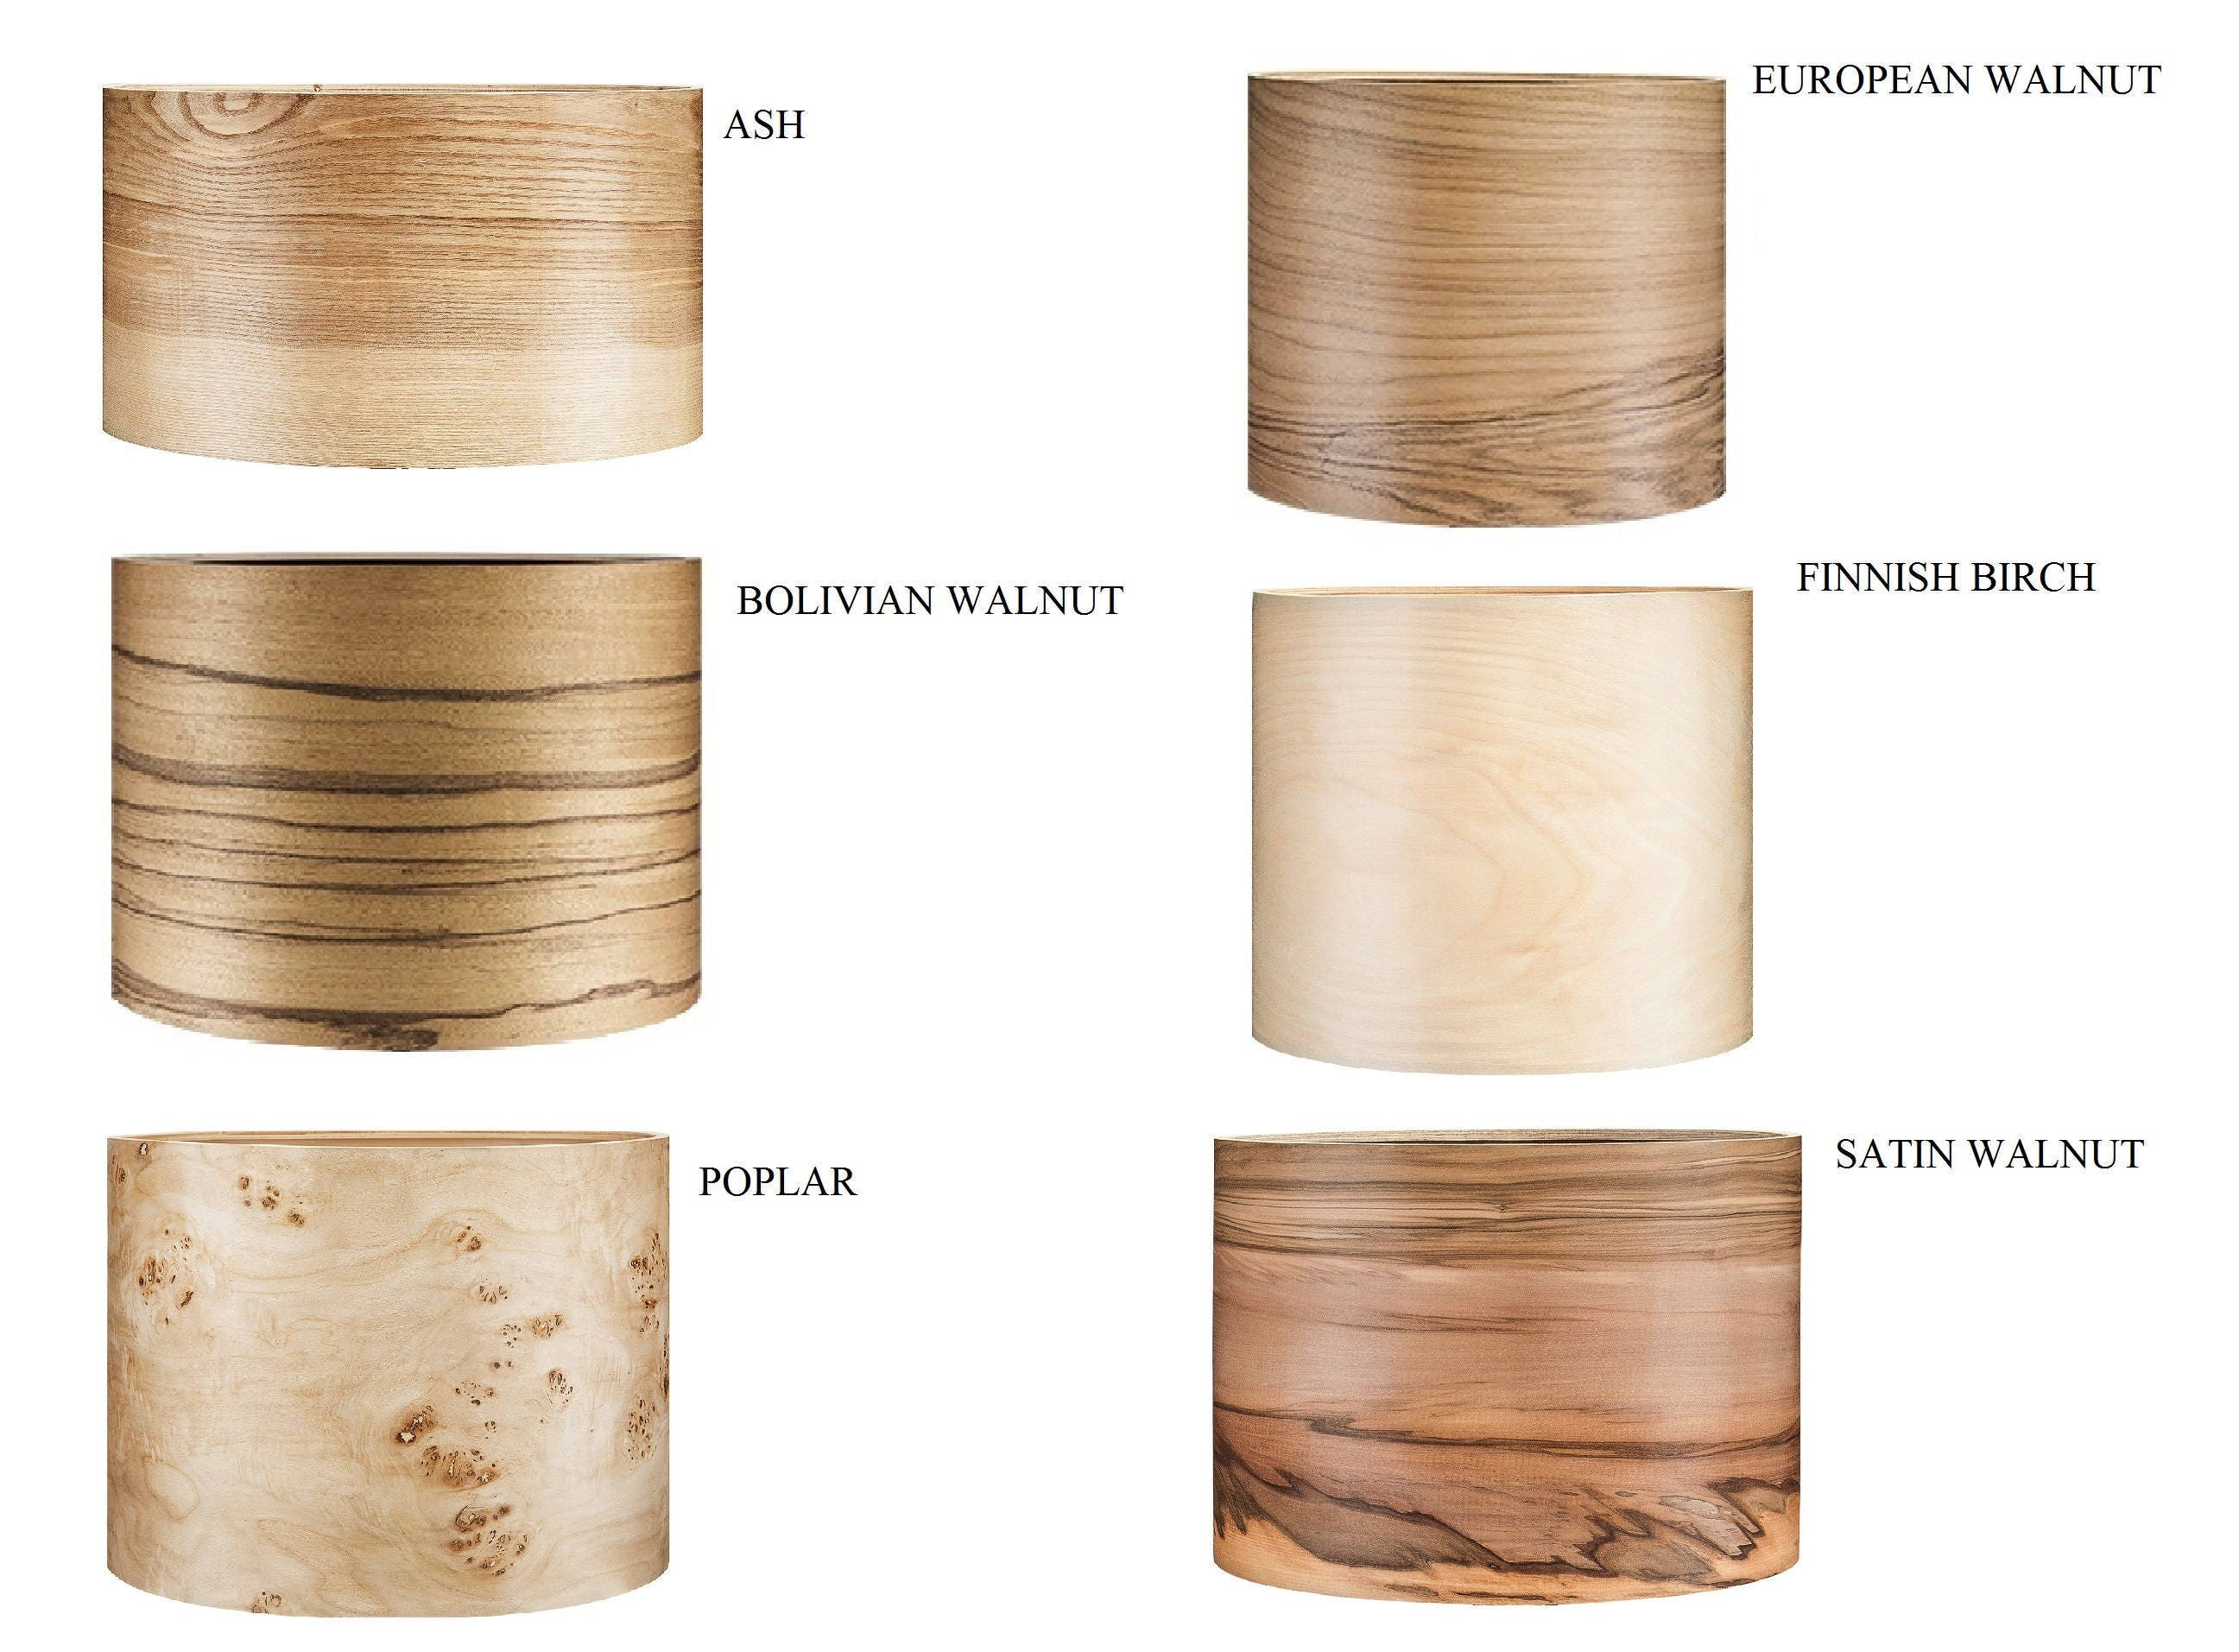 Wooden Floor Lamp Veneer Lamp Shade Satin Walnut Natural Wood Lamps Lighting Modern Lamps Lampshades